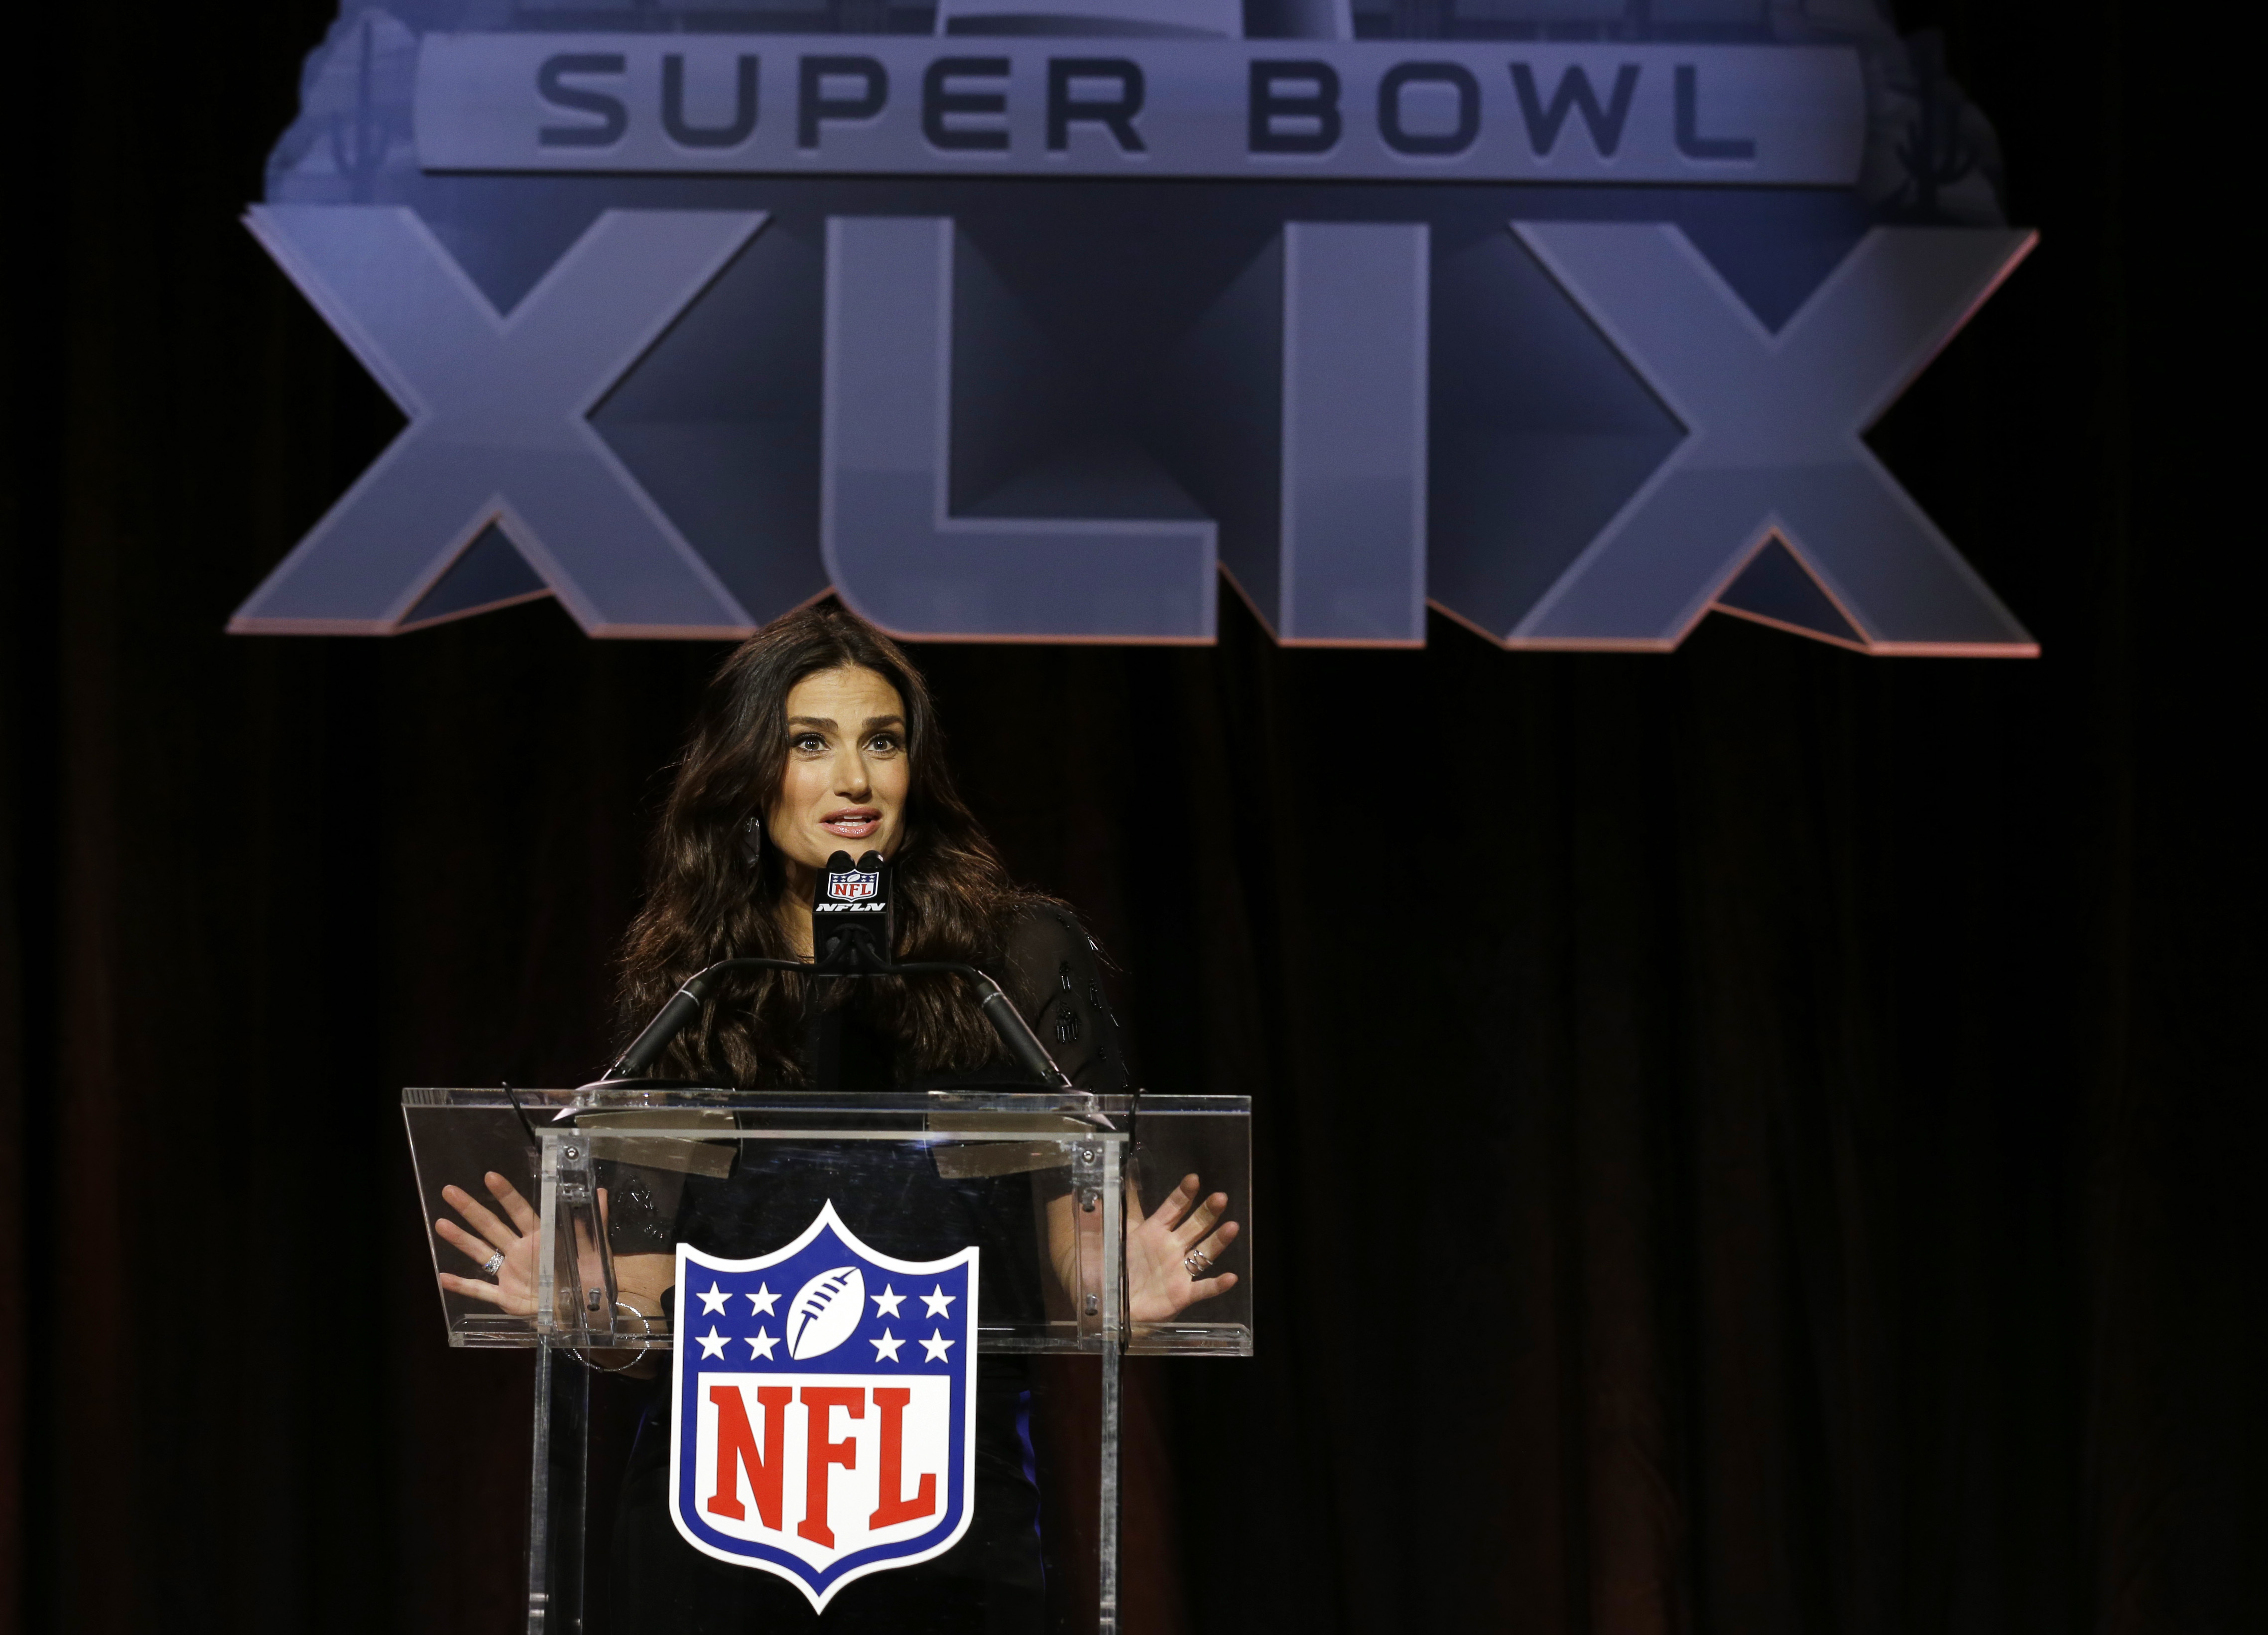 Idina Menzel ready for spotlight at Super Bowl